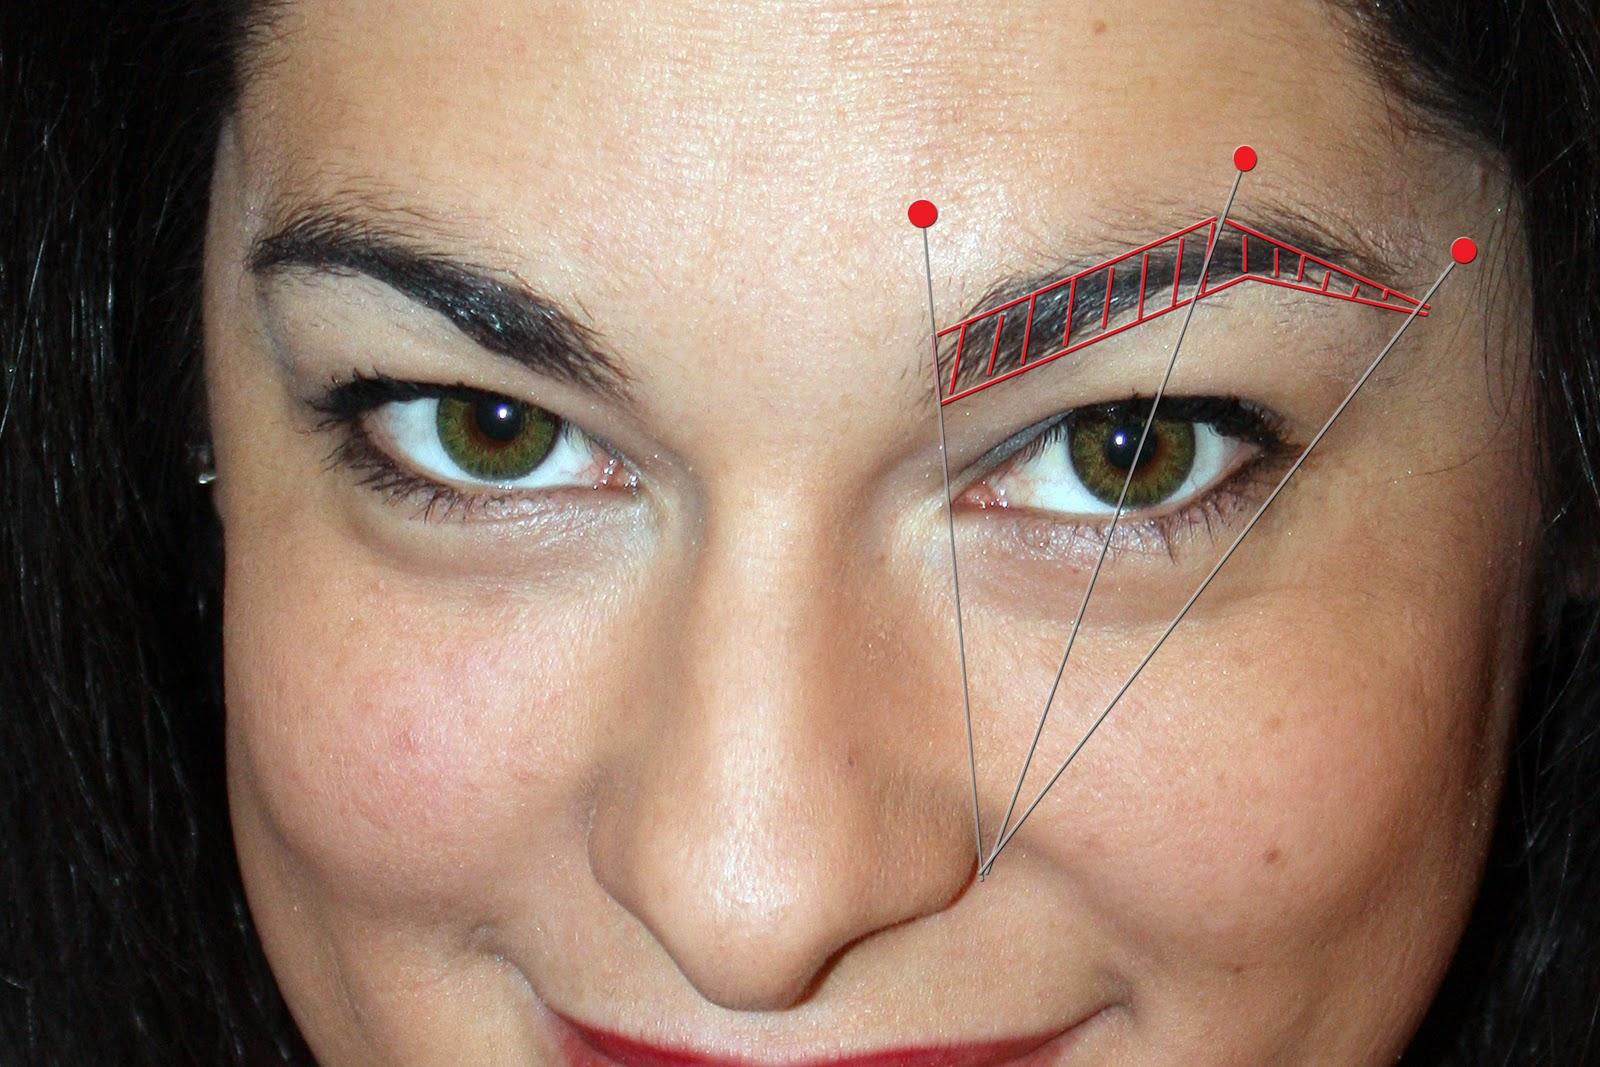 Tattoo Above Eyebrow Meaning: Rachel Ferran Make-Up Artist: HD (High Definition) Brows